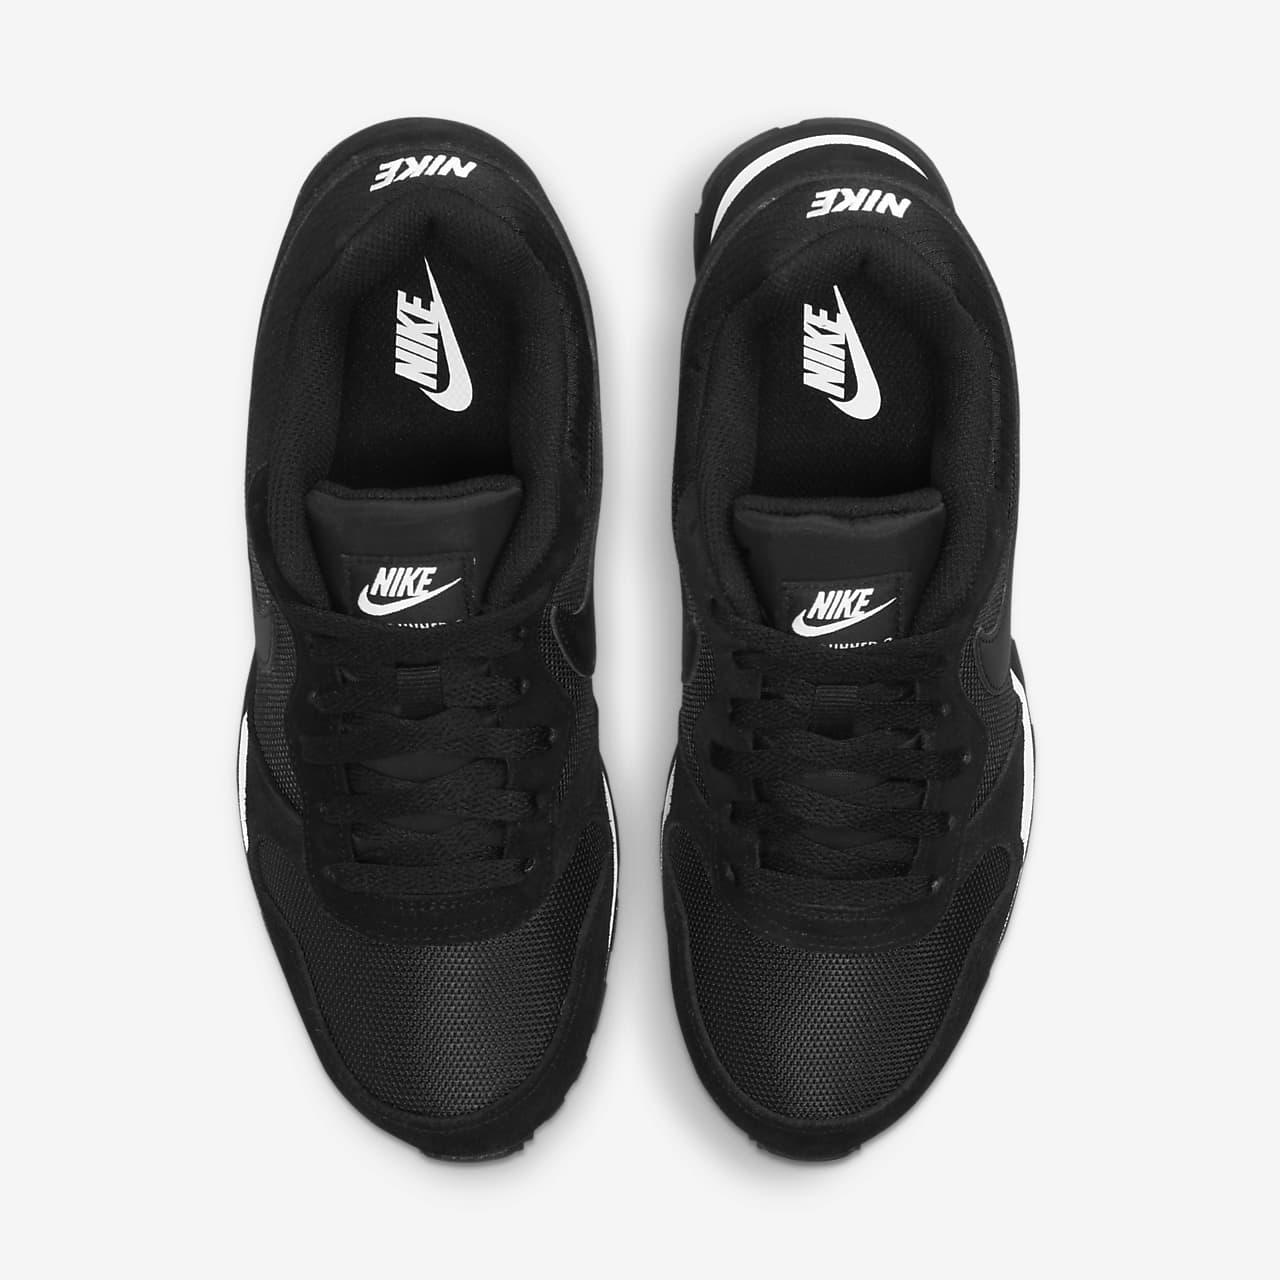 Zapatillas Casual De Mujer MD Runner 2 SE Nike Beige Venta